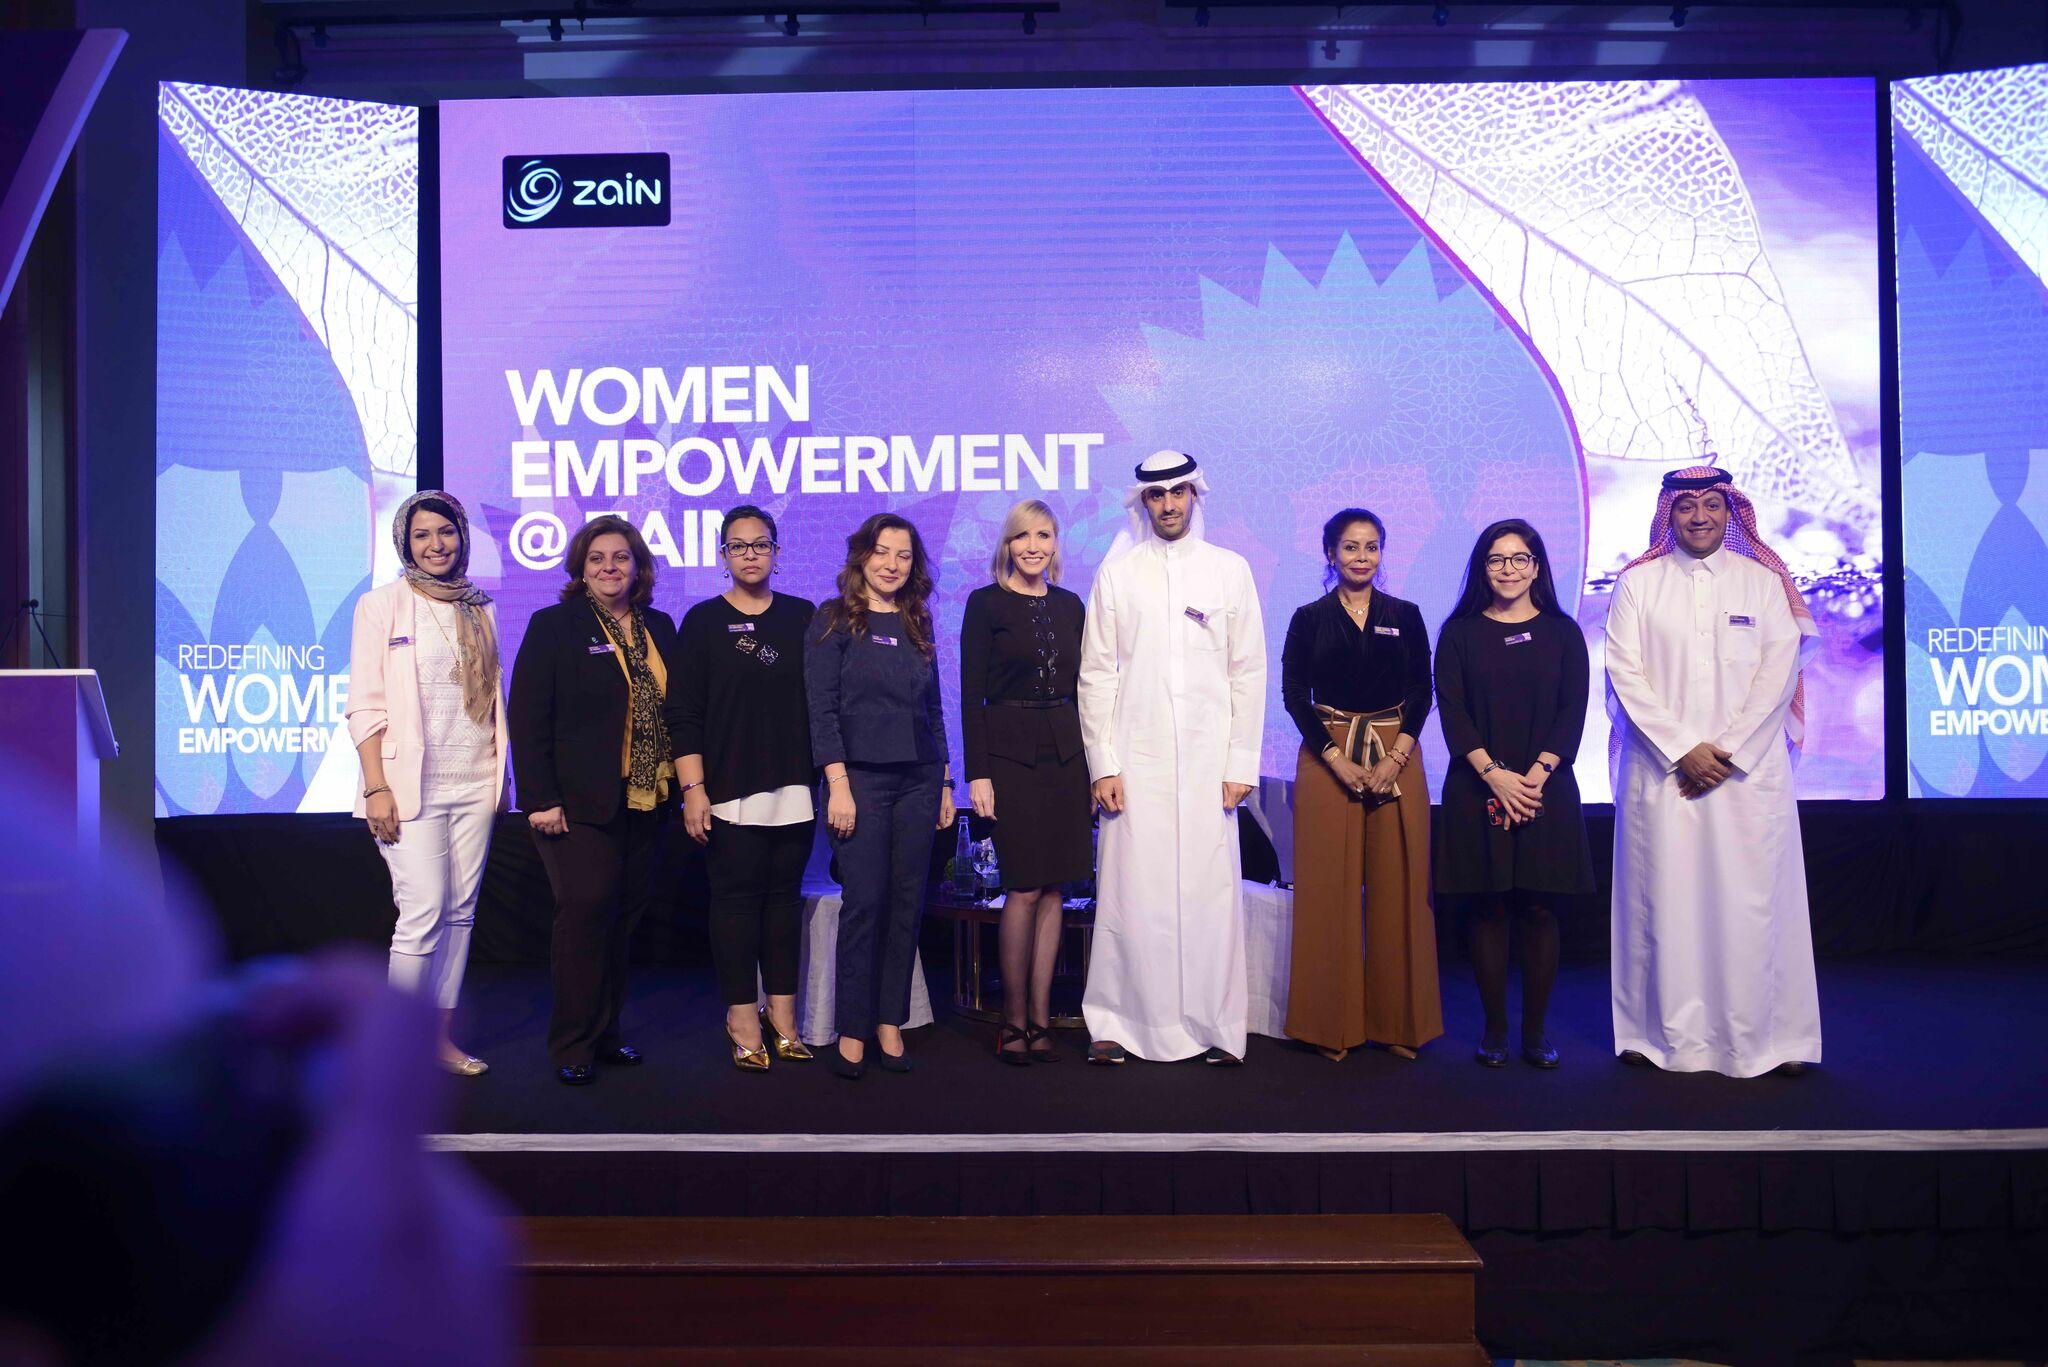 Zain Group introduces Women Empowerment Network initiative